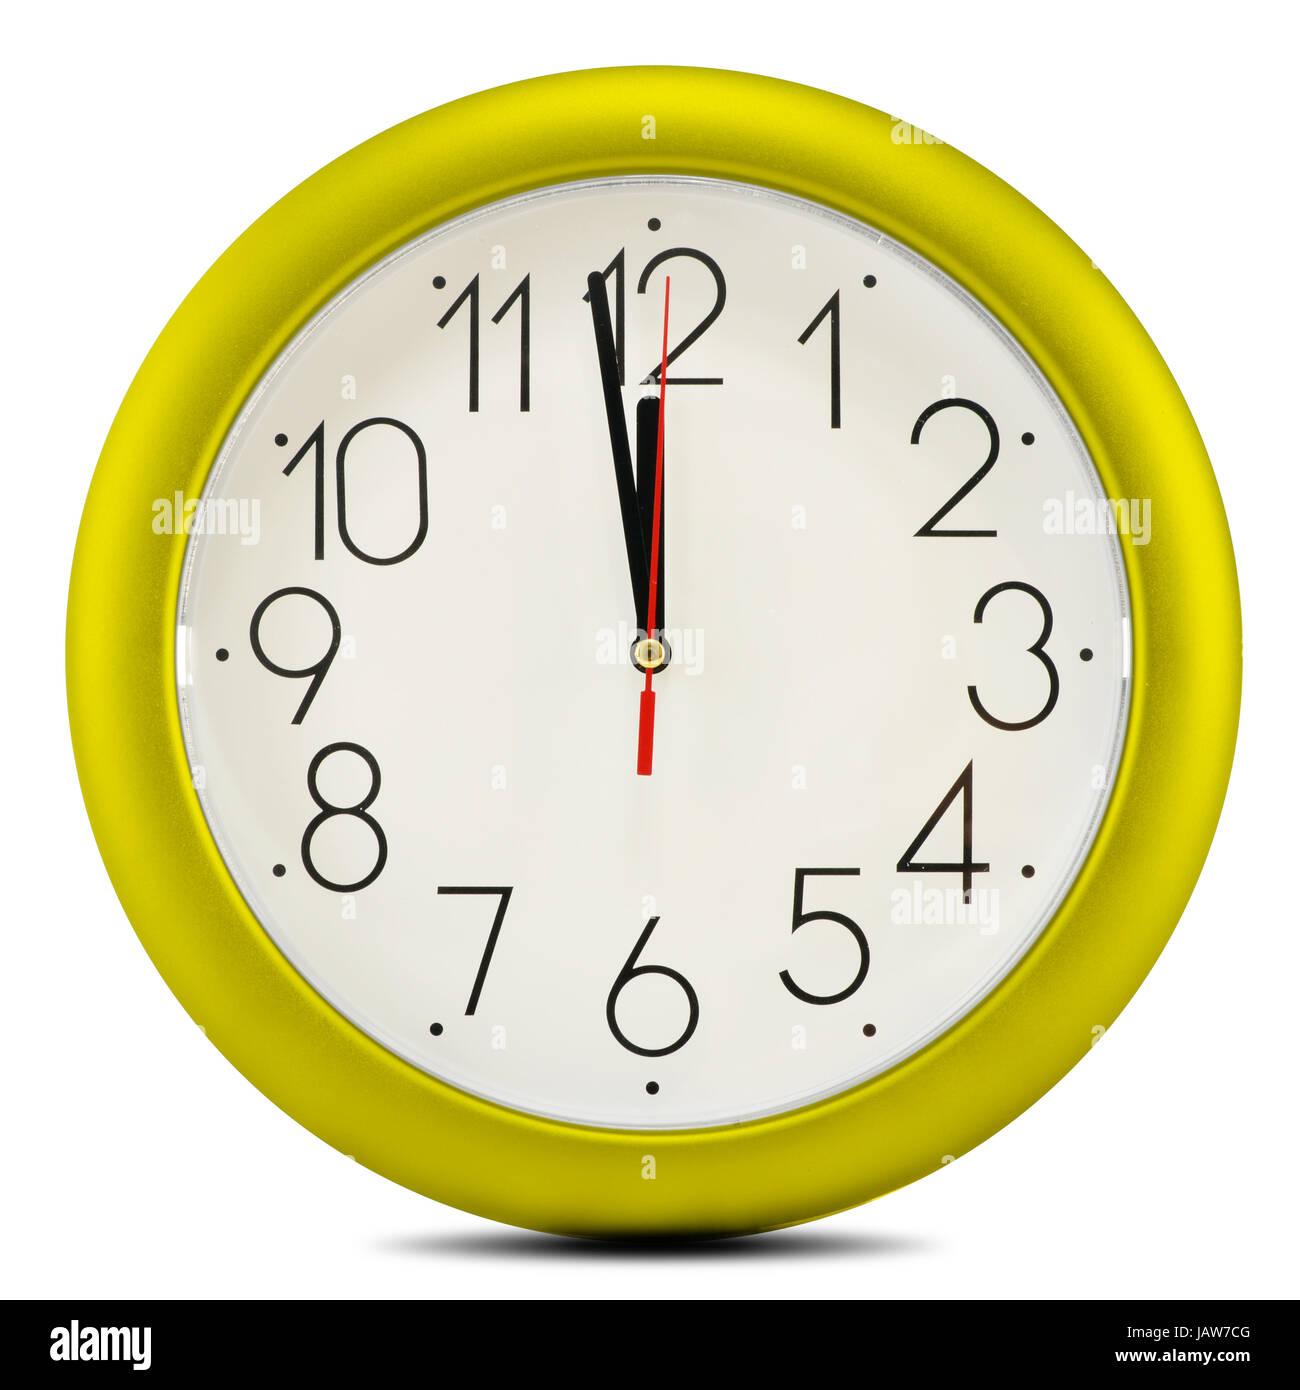 Wall clock isolated on white background. Twelve o'clock - Stock Image